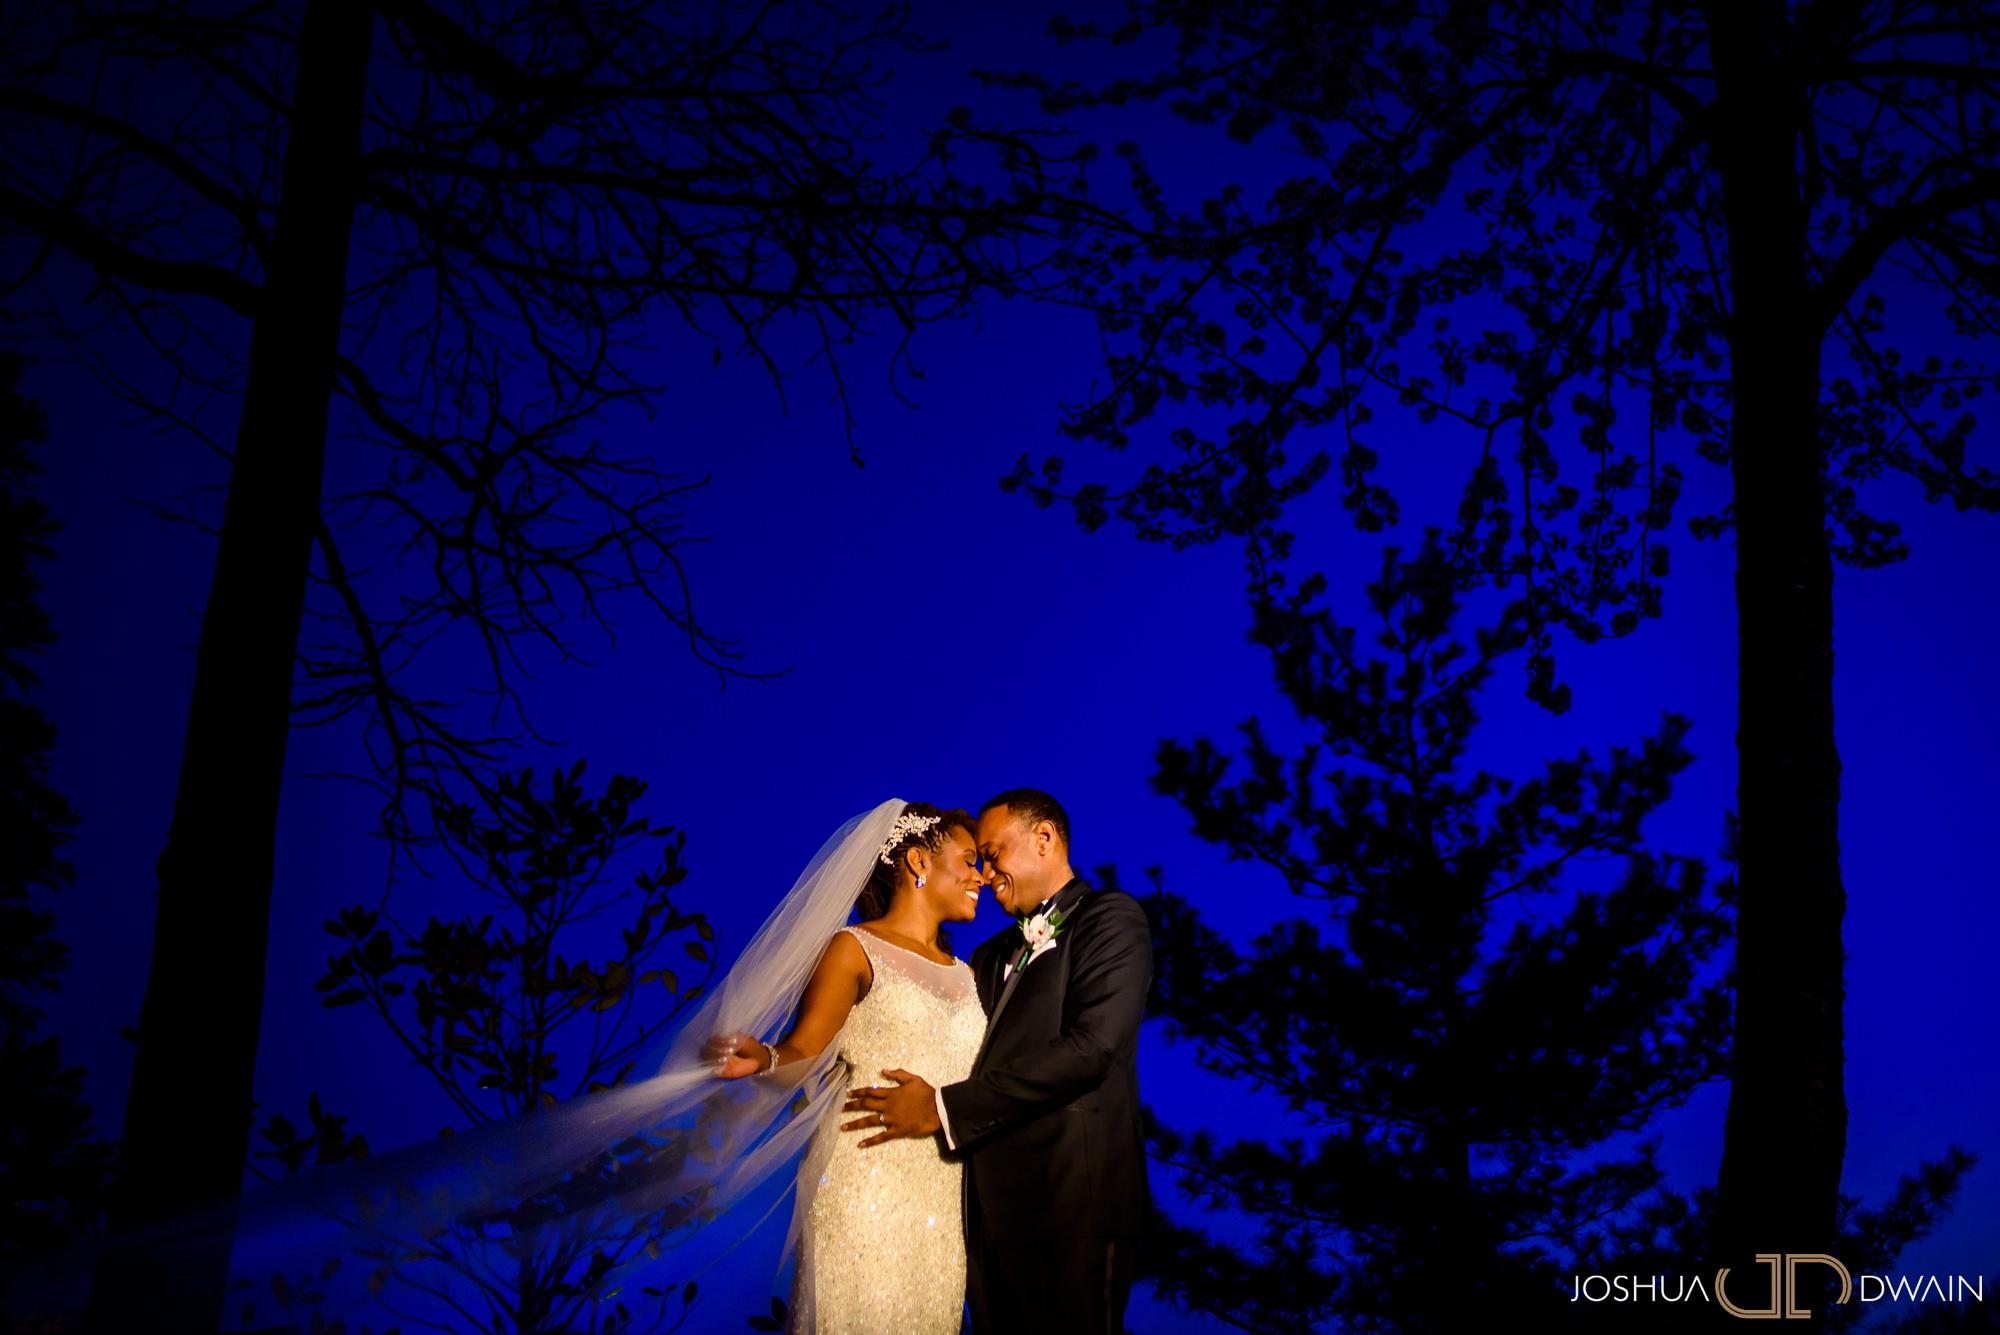 regine-jevon-021-26-crest-hollow-long-island-wedding-photographer-joshua-dwain